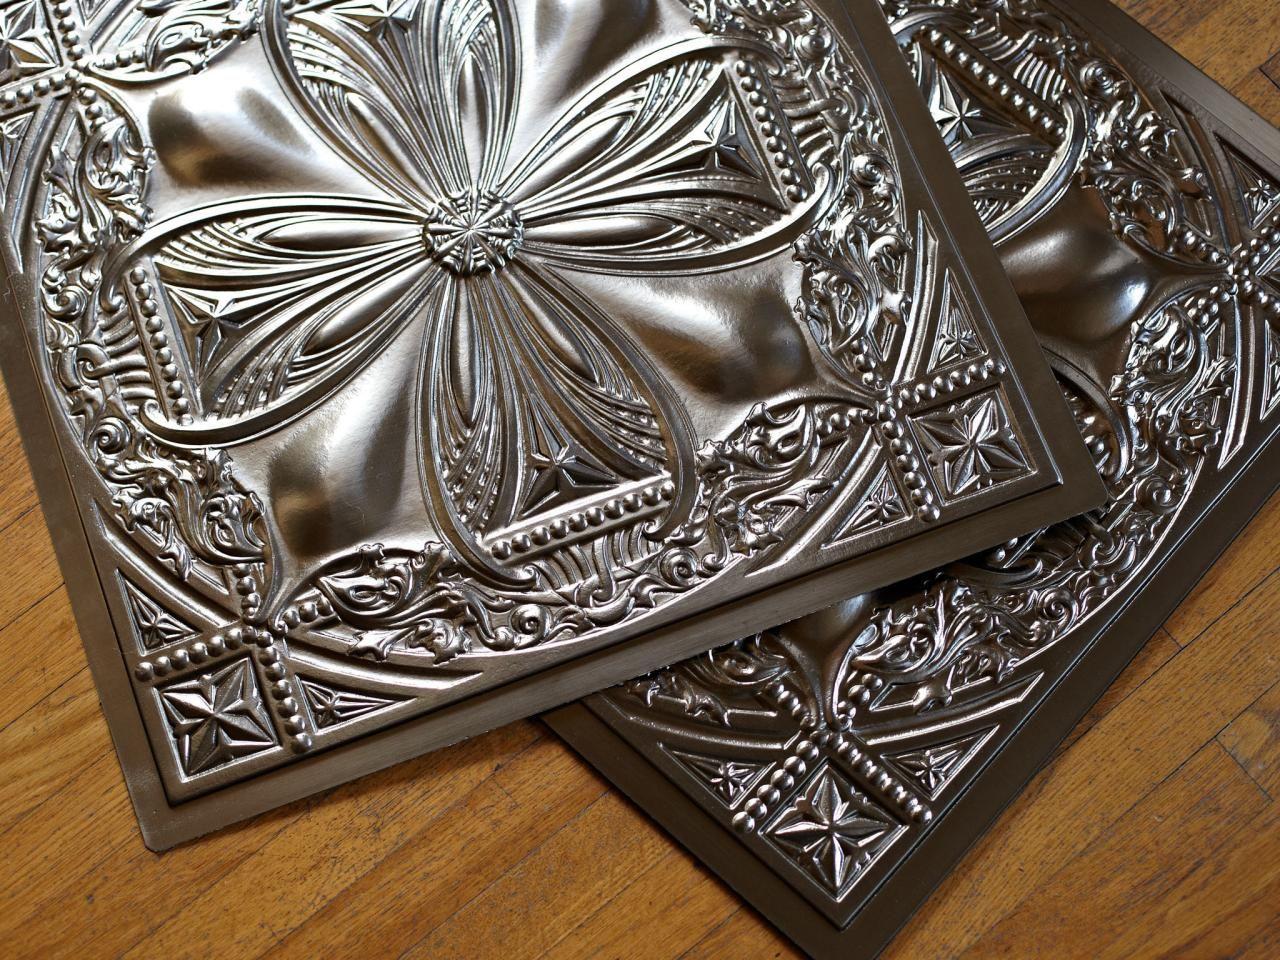 Decorative Tin Backsplash Tiles Amusing How To Install Tin Ceiling Tiles  Tin Ceilings Ceiling Tiles And Design Decoration